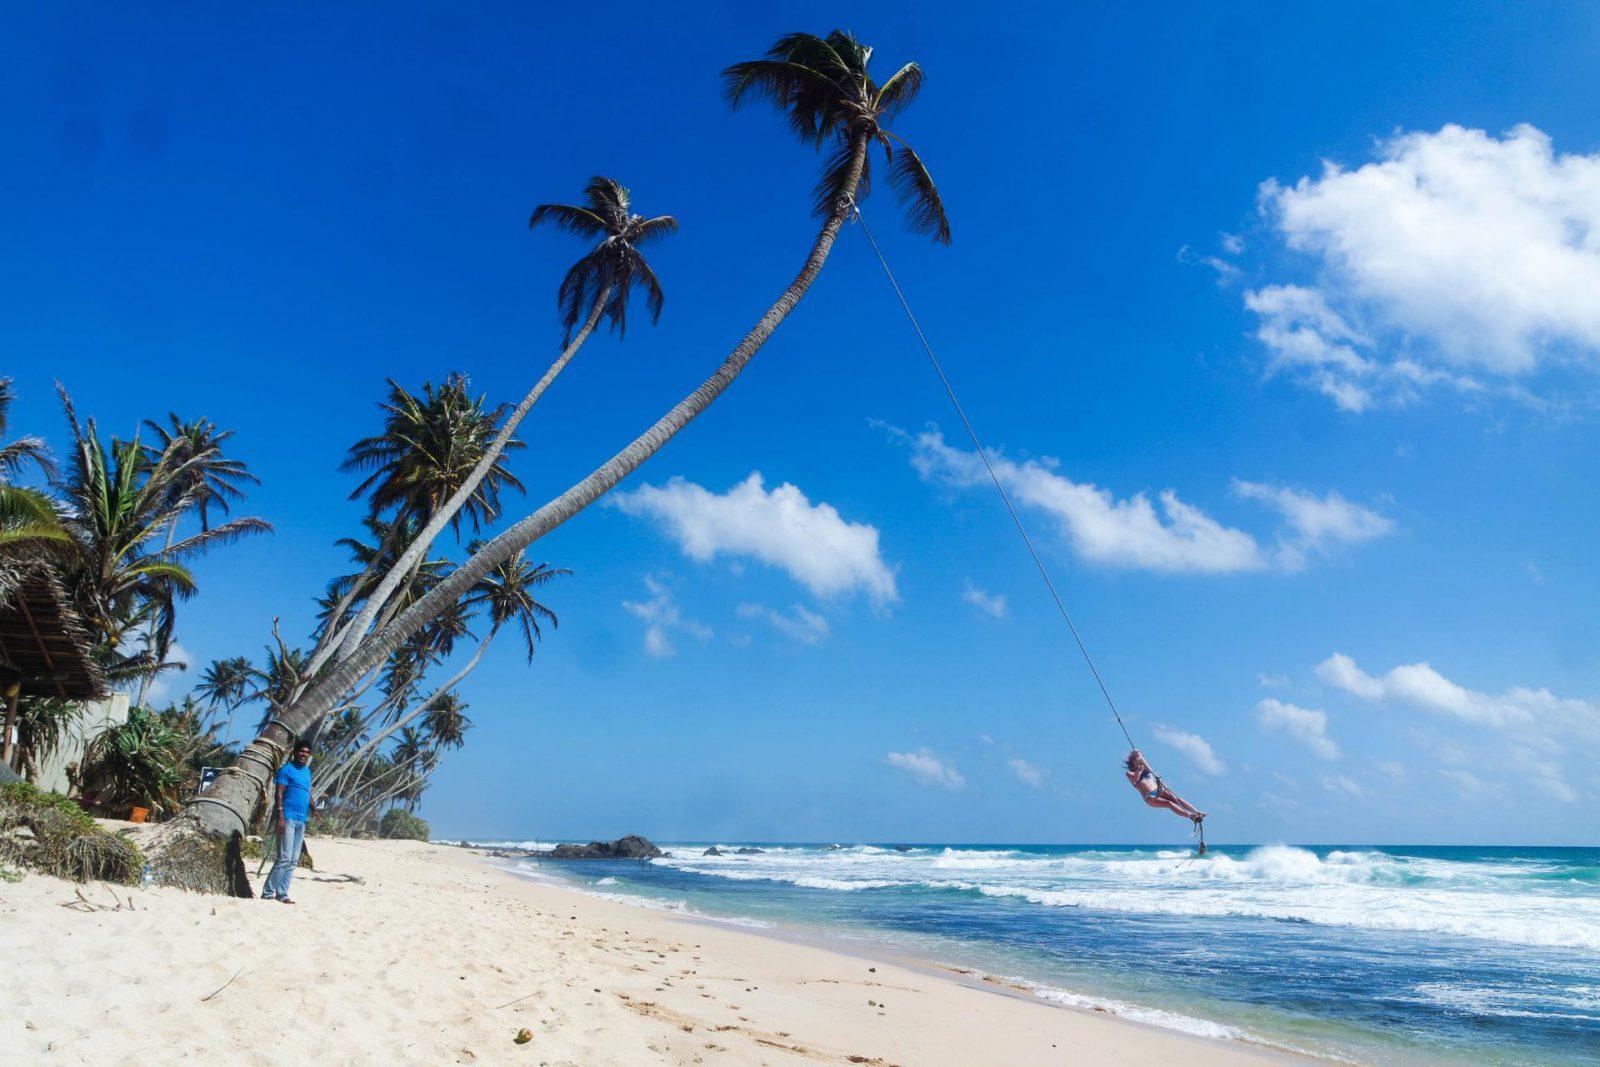 sri-lanka-travel-diary-rope-swing